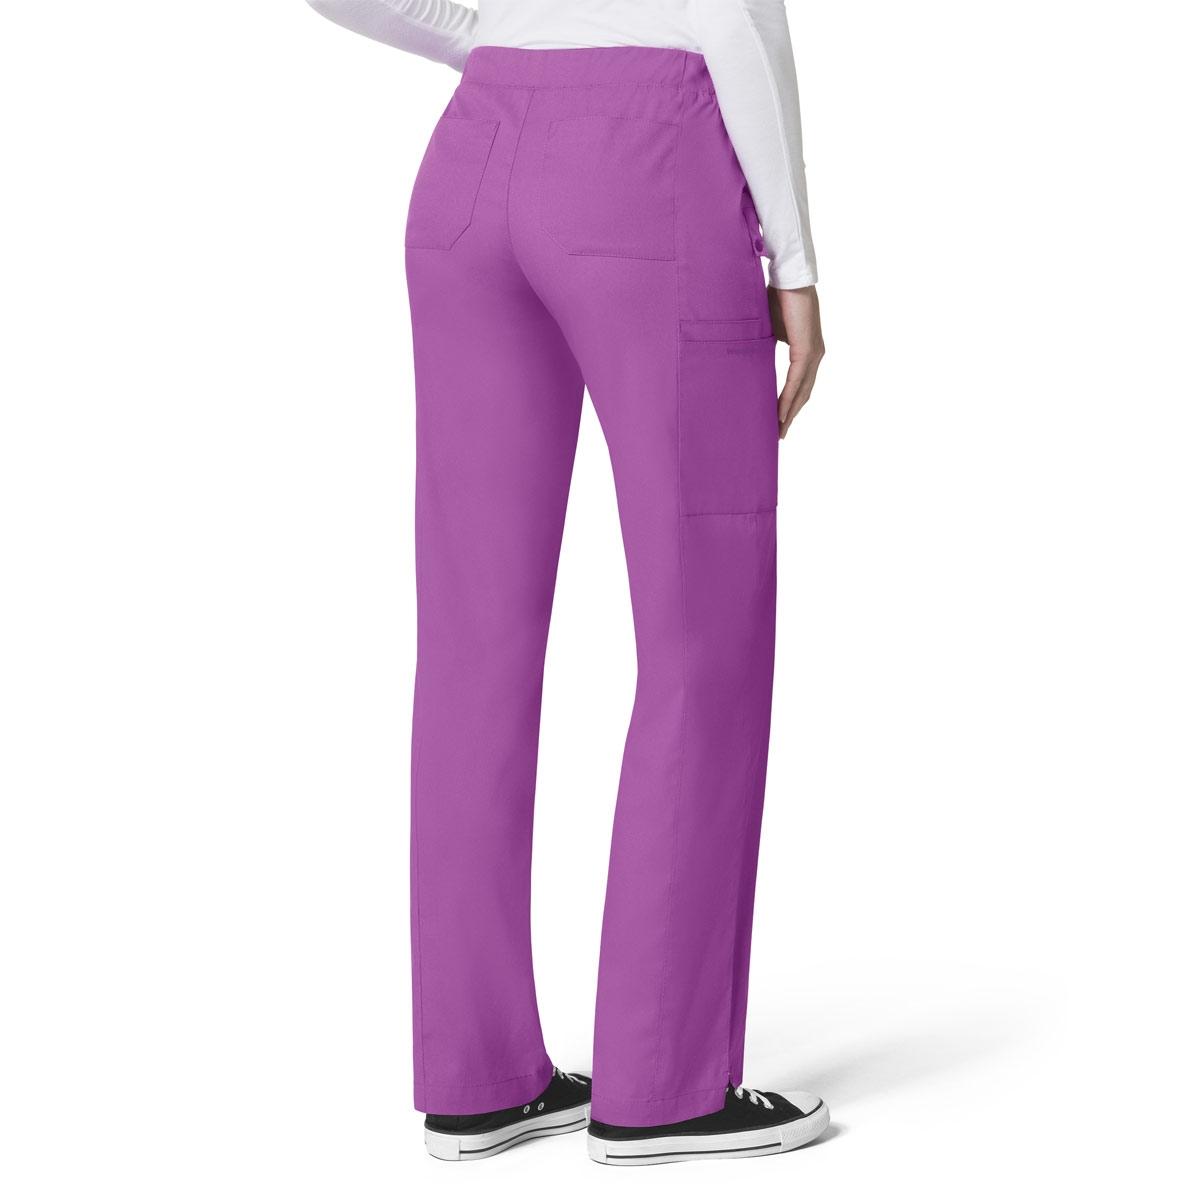 07790257def Women s Next Madison Elastic Waistband Scrub Pants - WonderWink Scrubs